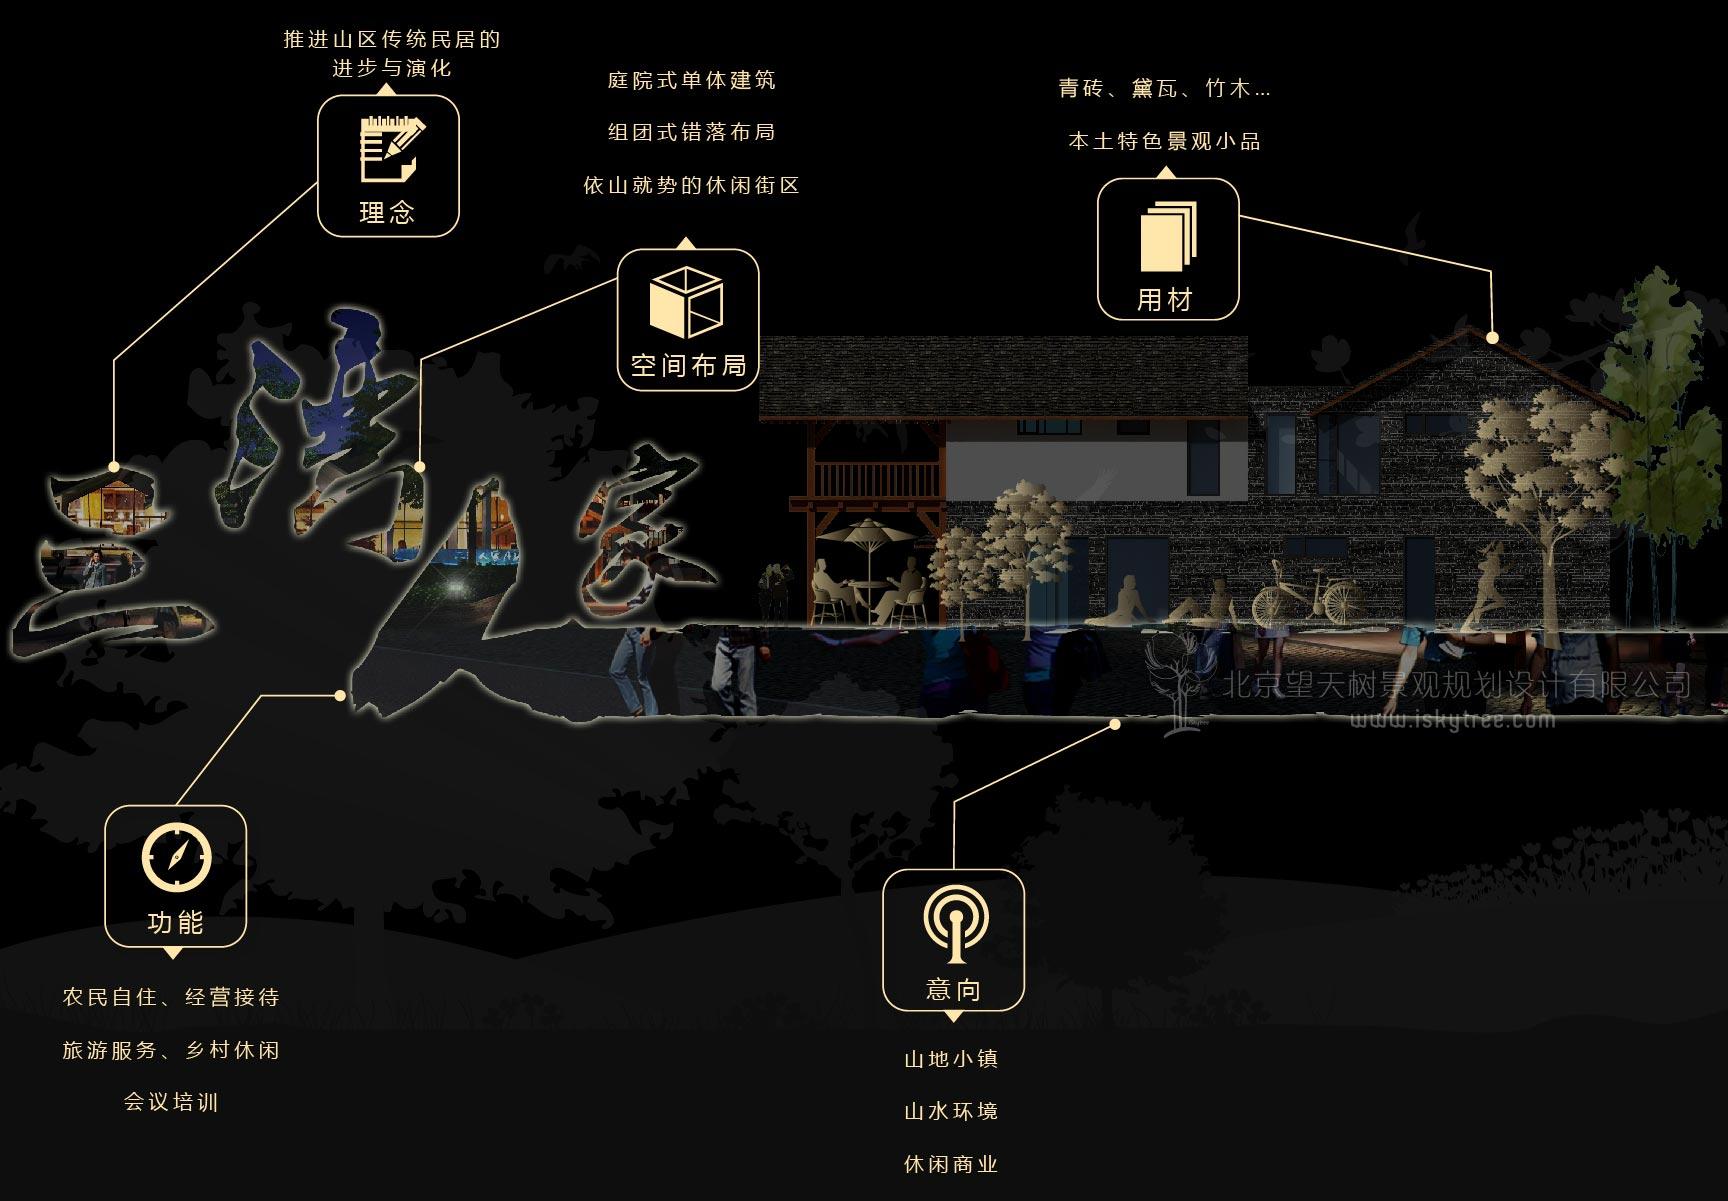 qy188千赢国际特色村新农村规划设计思路分析图